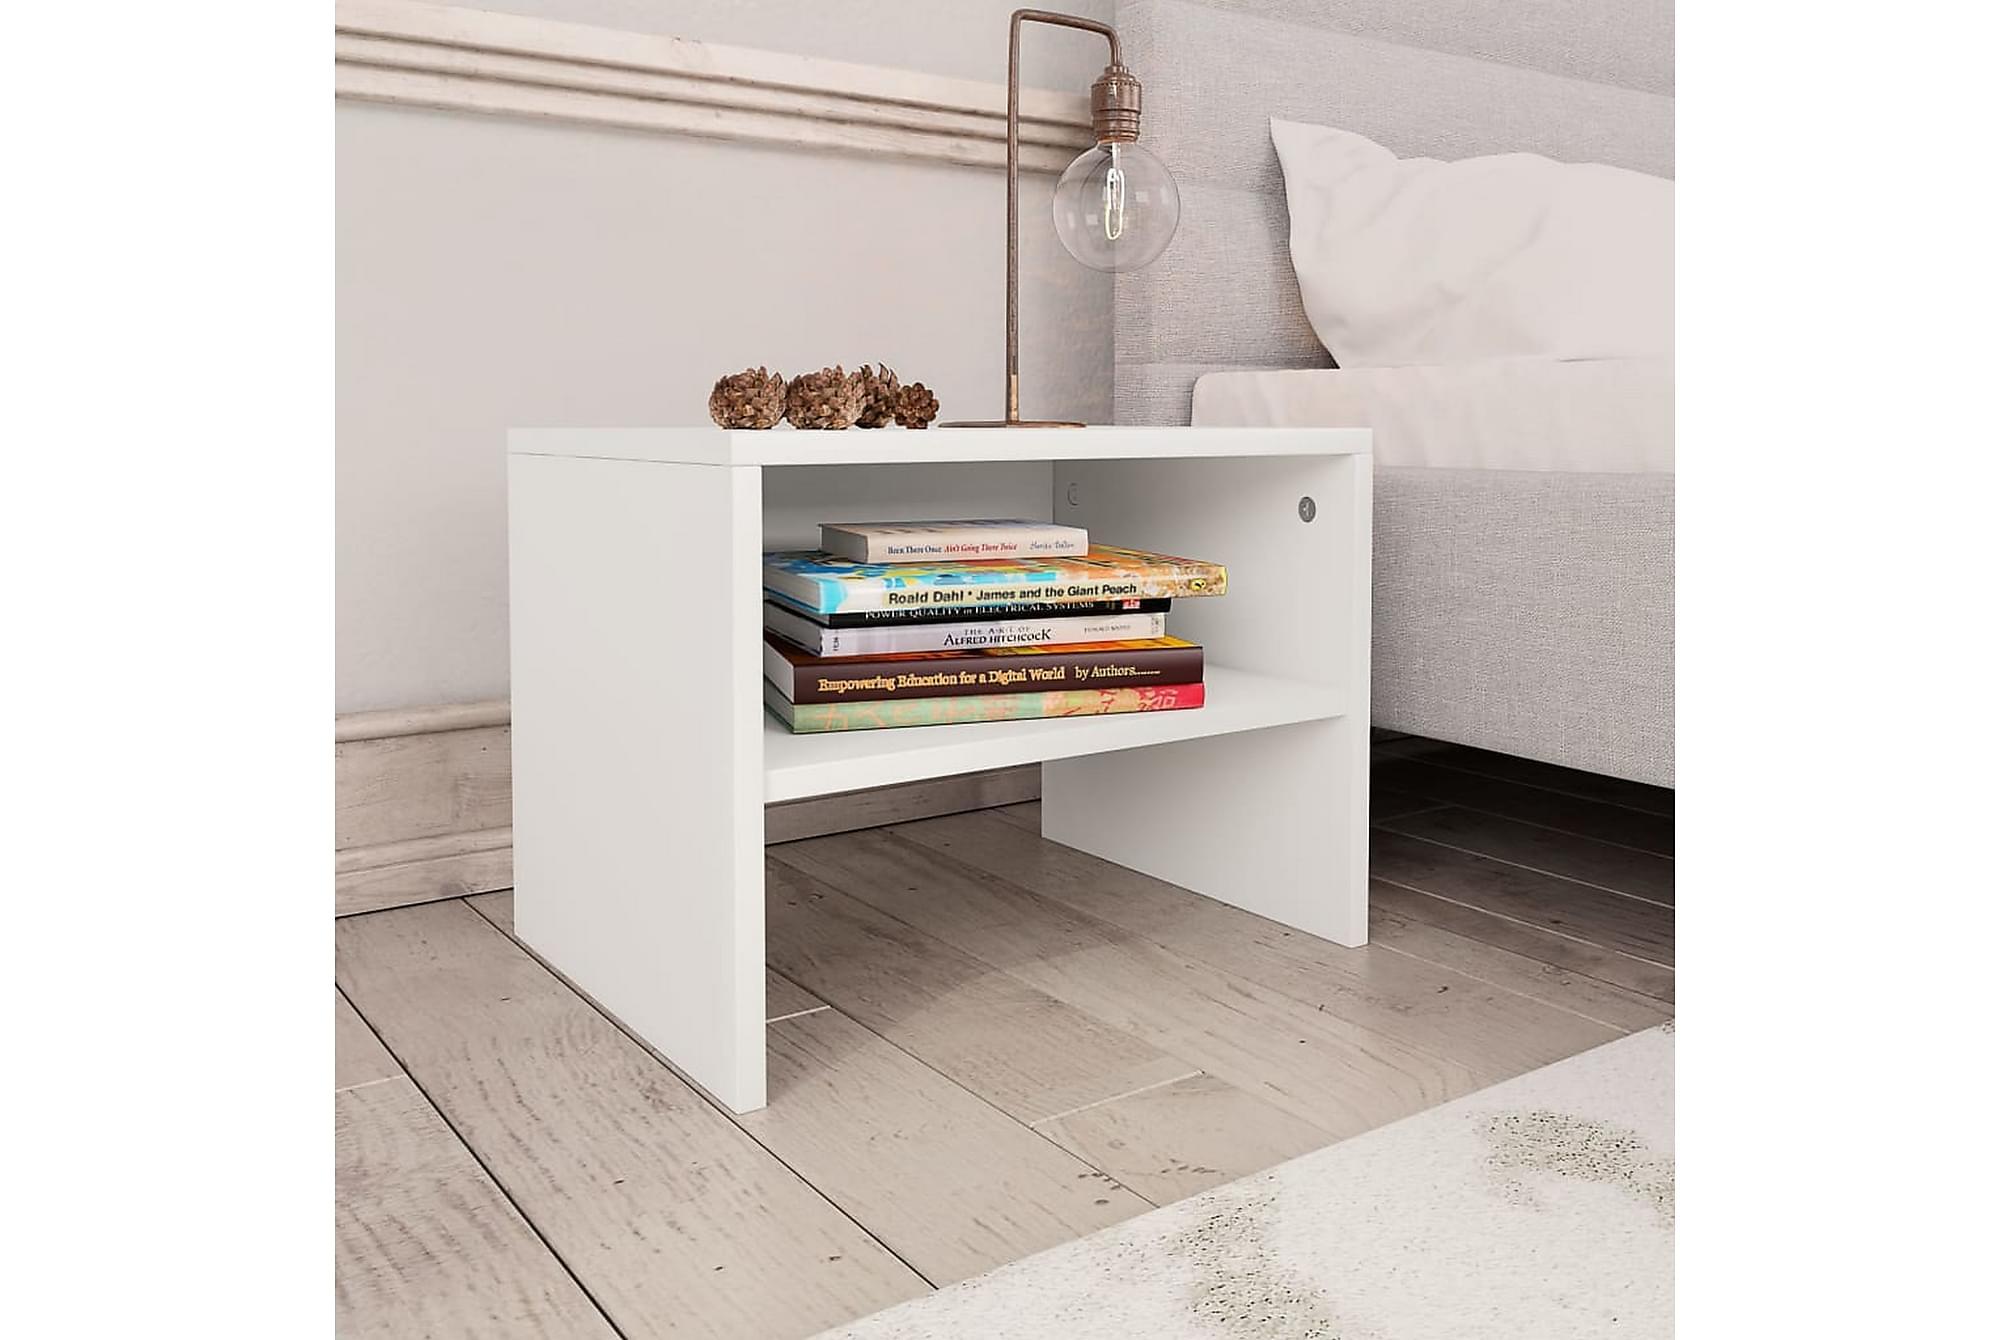 Sängbord 2 st vit 40x30x30 cm spånskiva